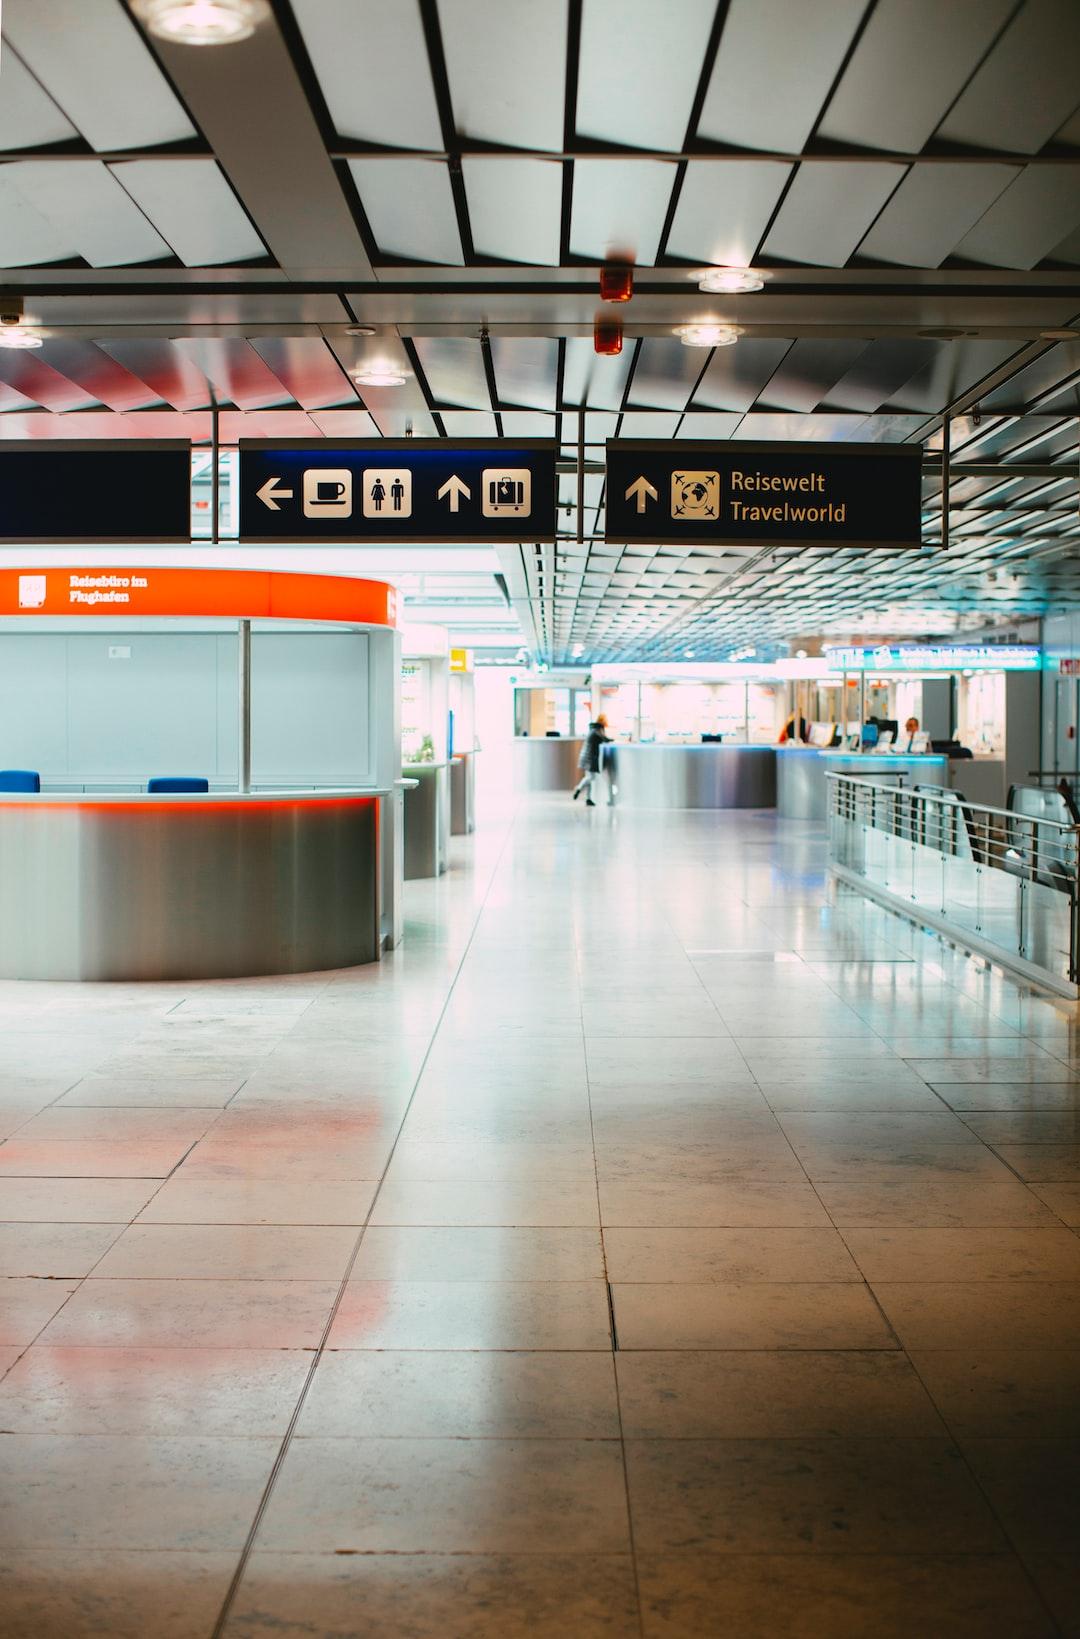 Deserted Airport - curfew gate dusk-to-dawn curfew. Coronavirus disease outbreak (COVID-19) – warning alarm.